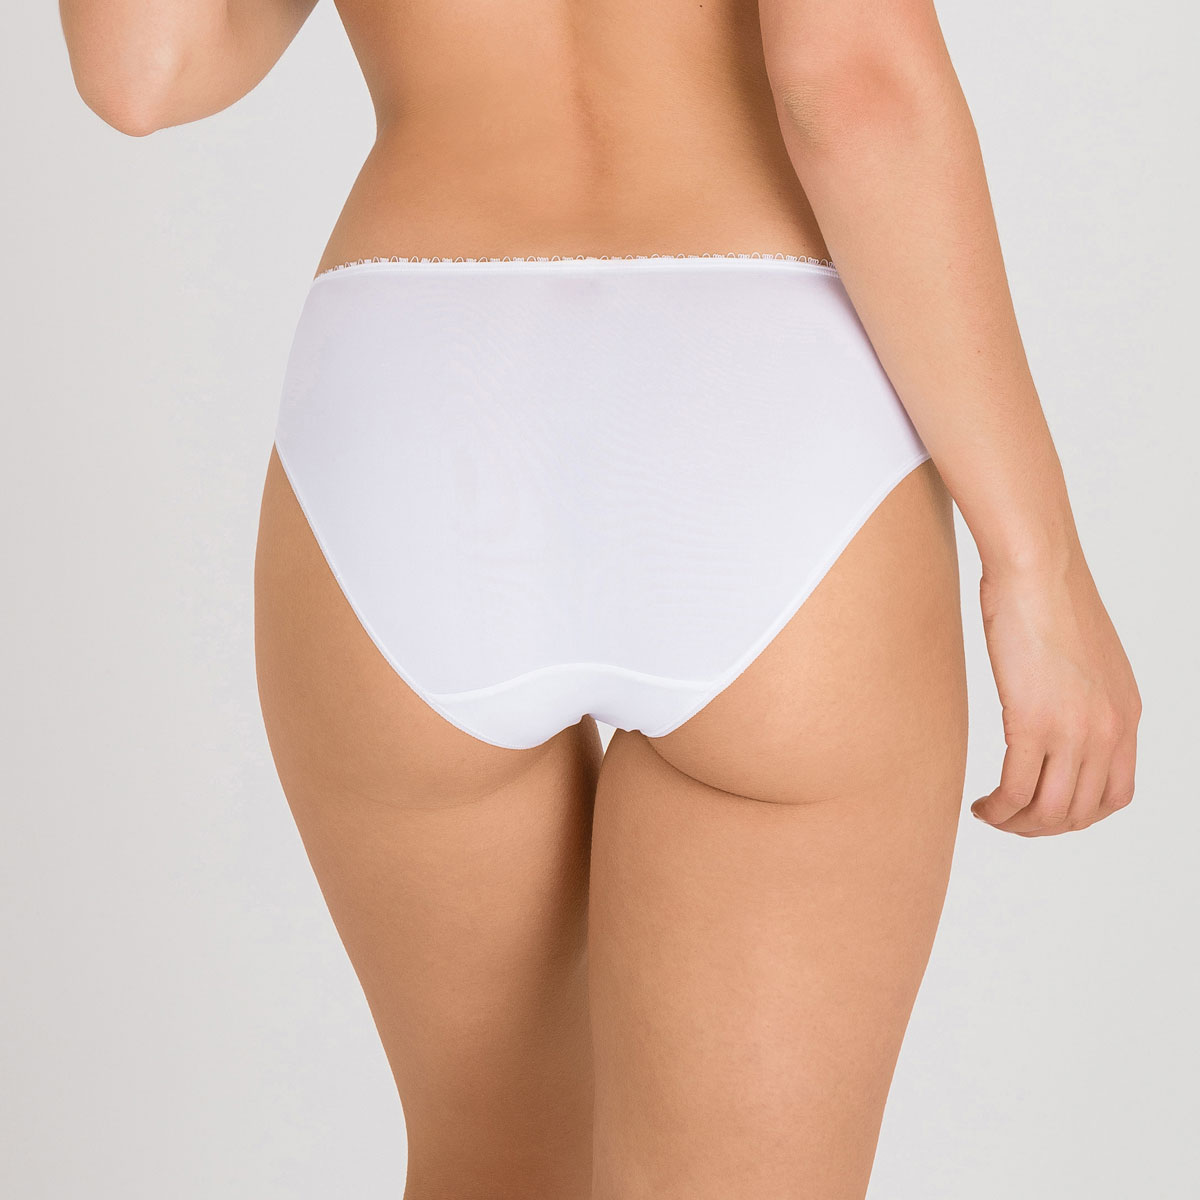 Braga mini blanca - Flower Elegance, , PLAYTEX